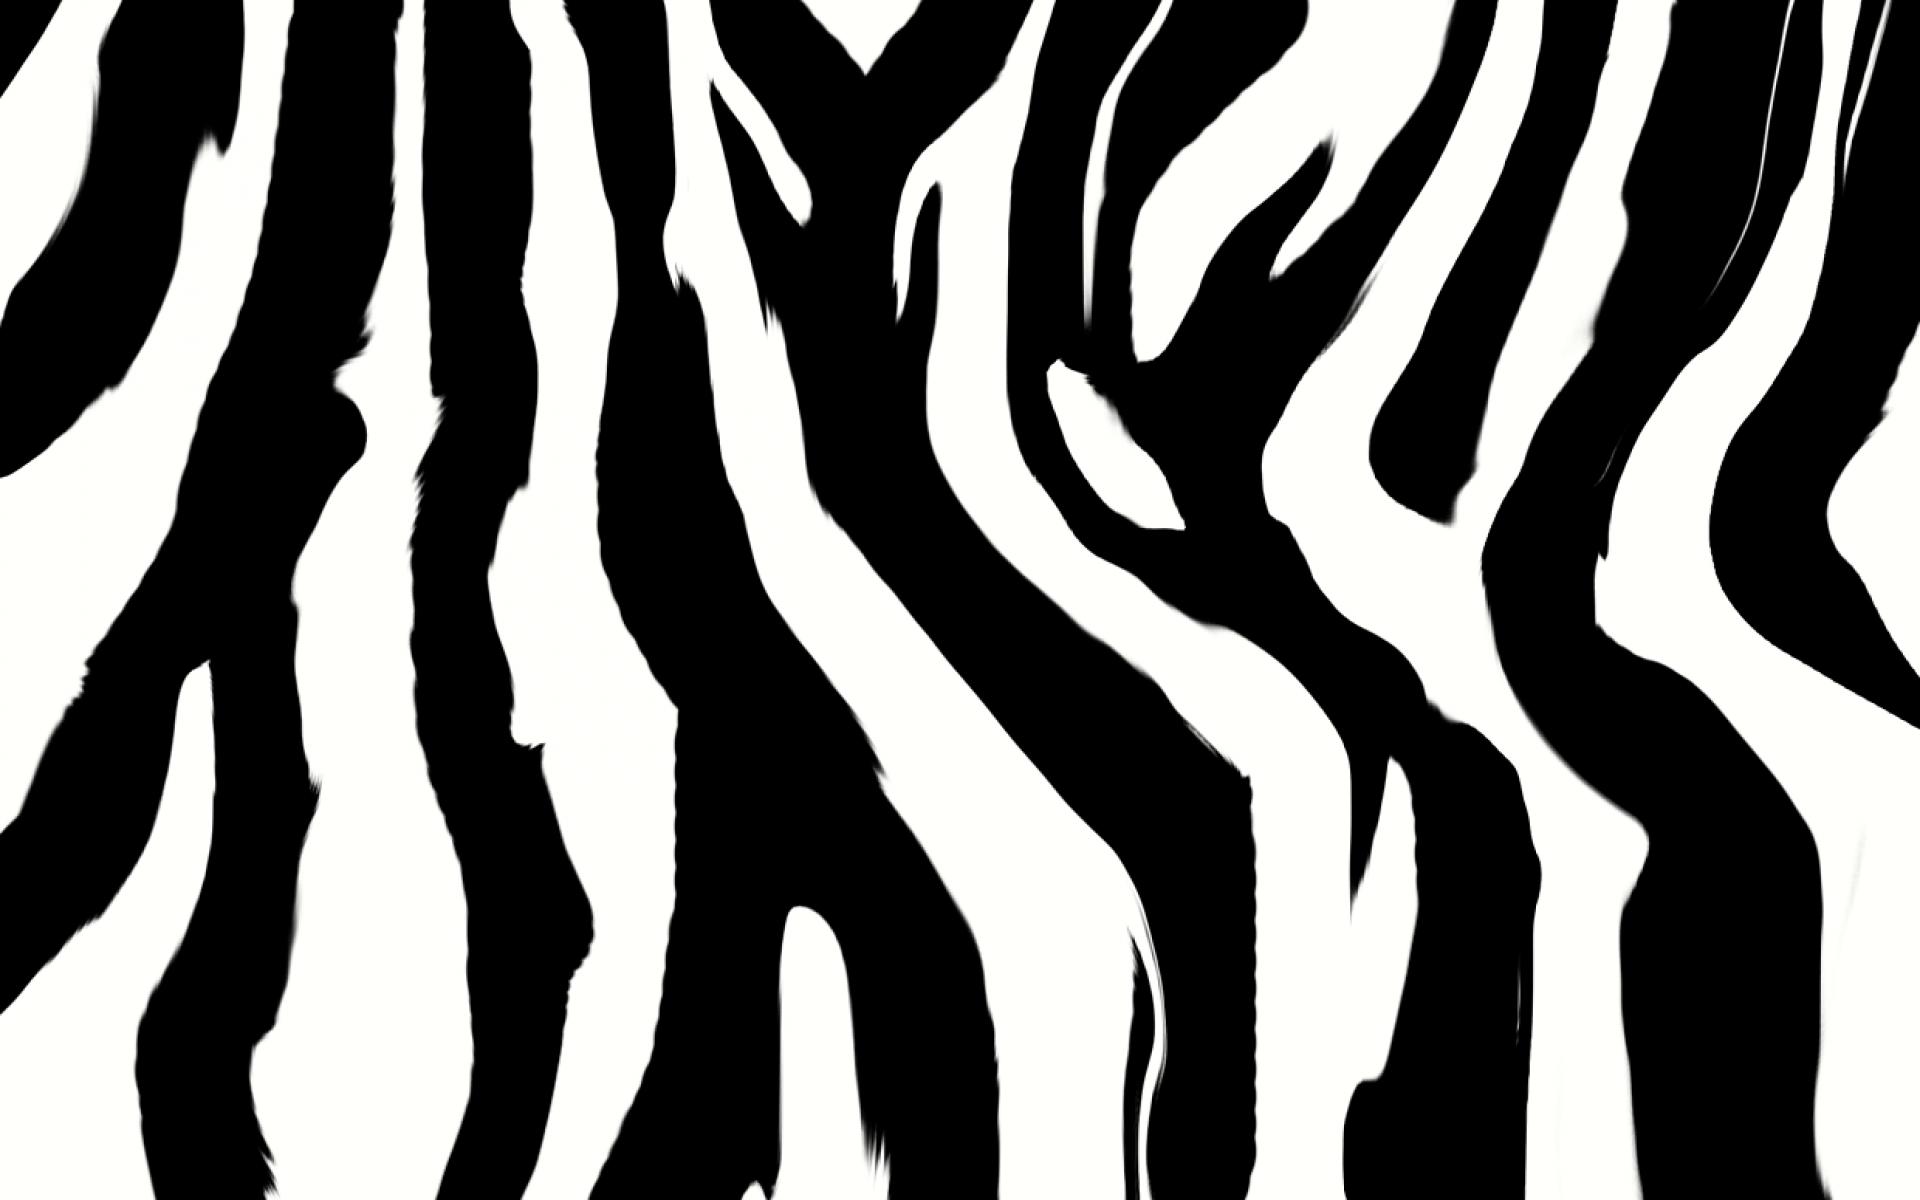 Animal print Zebra Desktop Wallpaper Clip art.